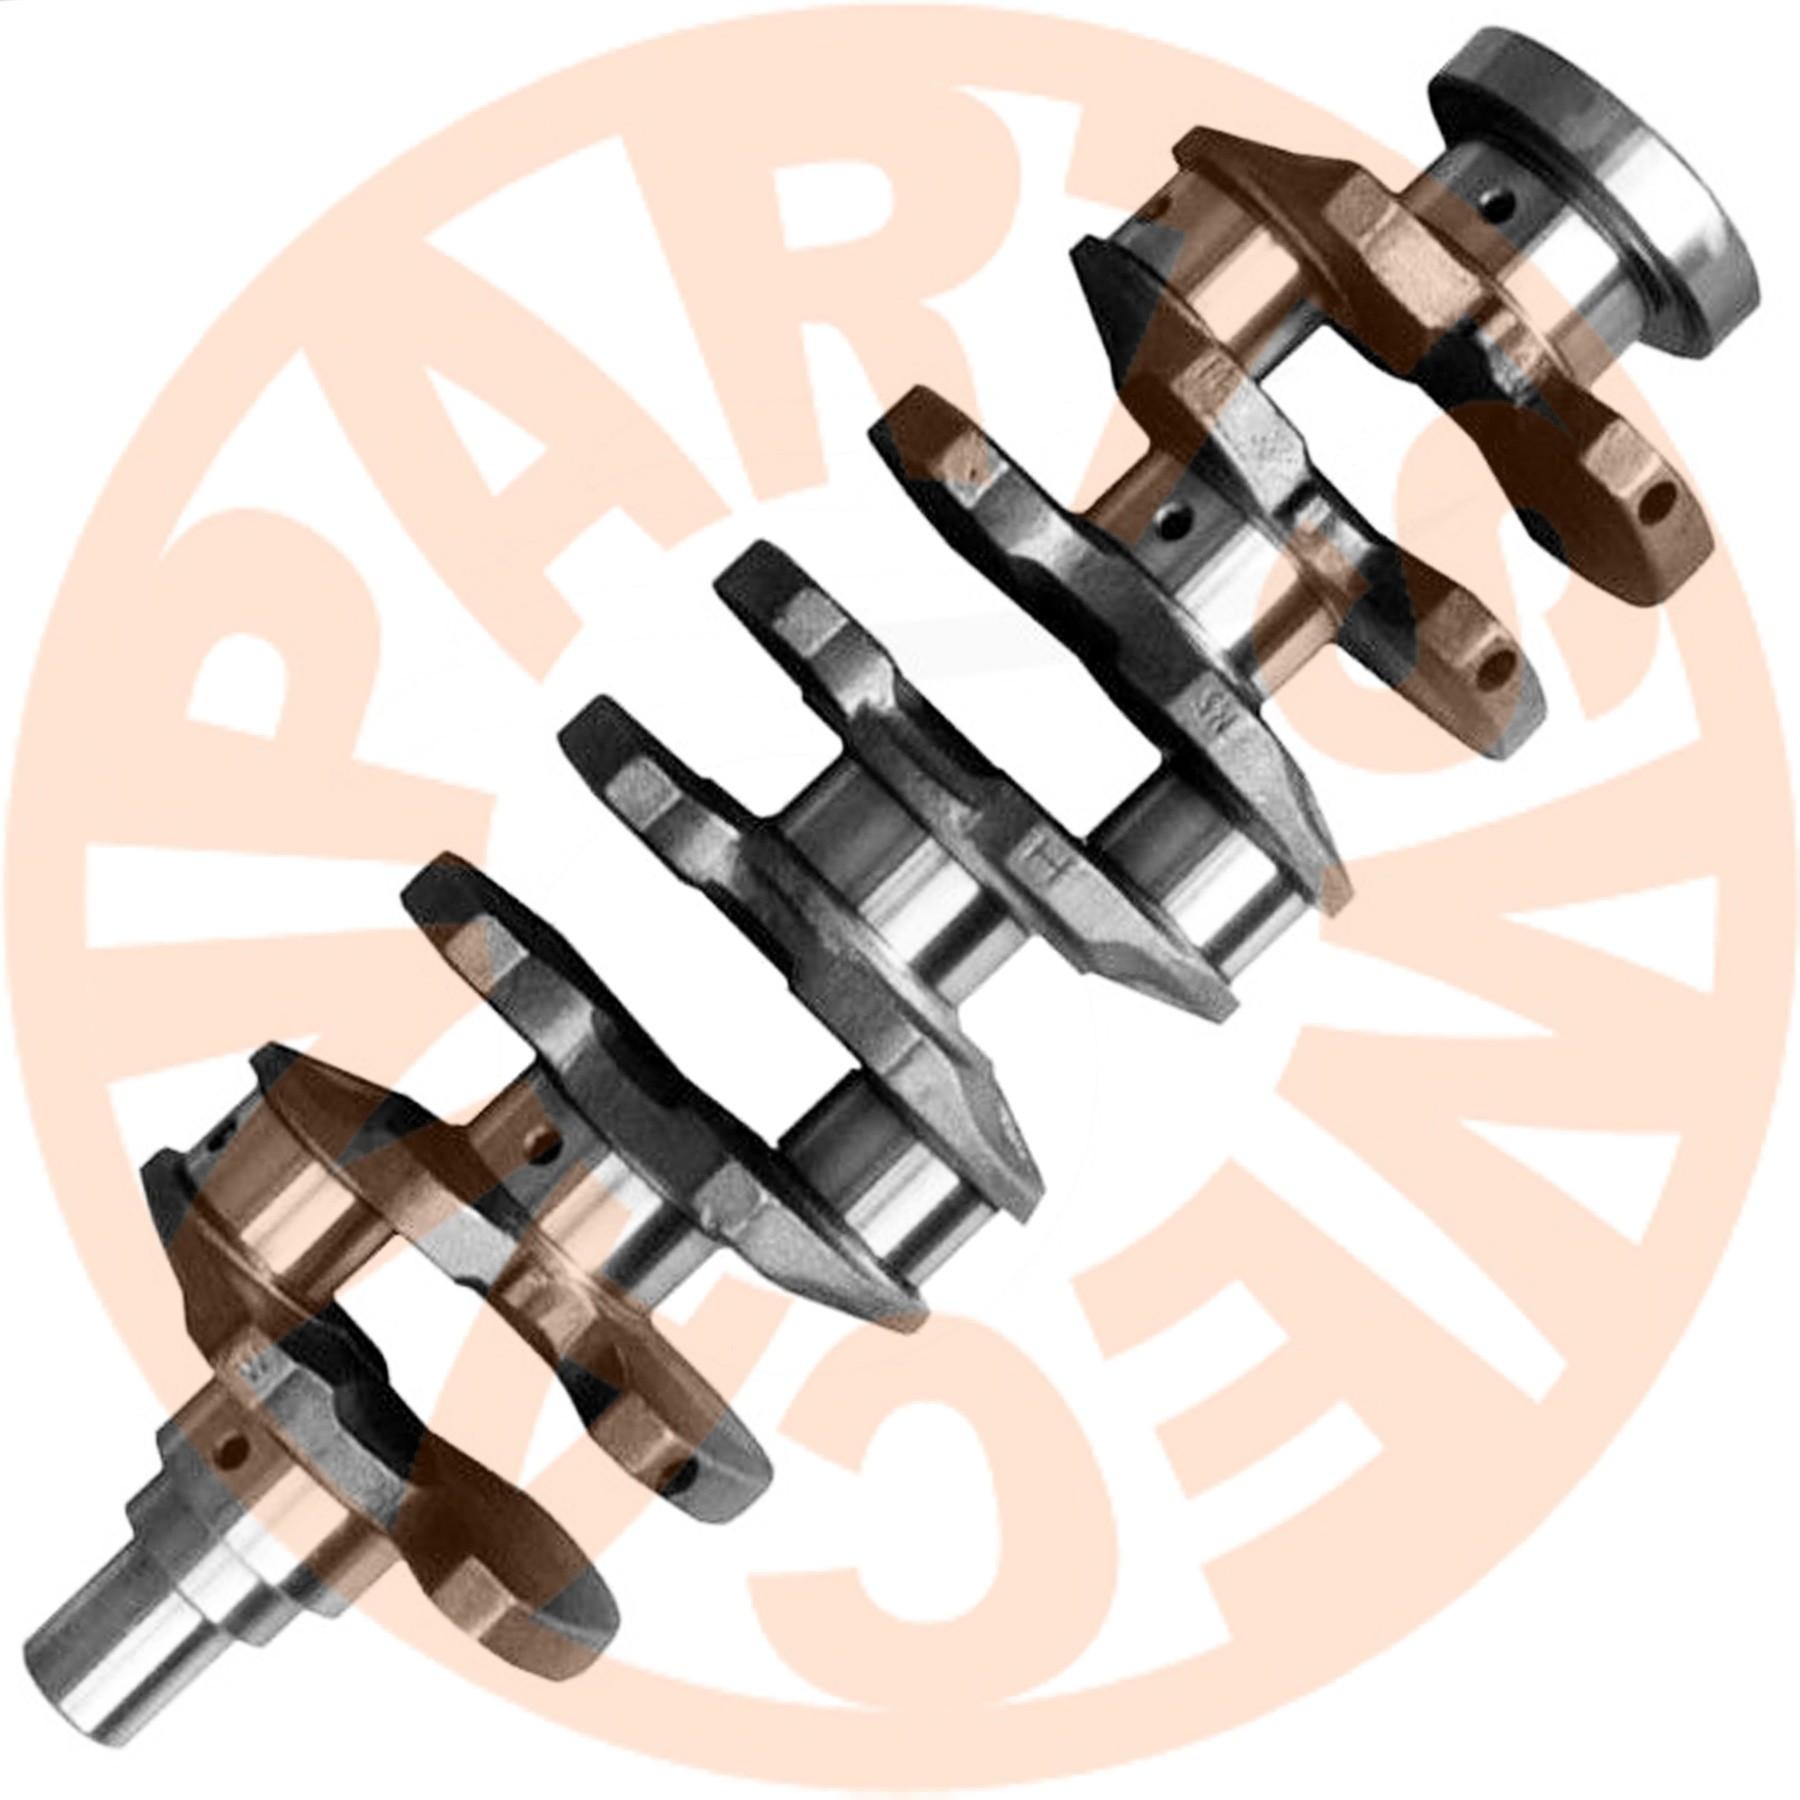 Crankshaft Mitsubishi 4g63 Engine Md187924 Md346022 Forklift 4g63t Wiring Harness Aftermarket Parts